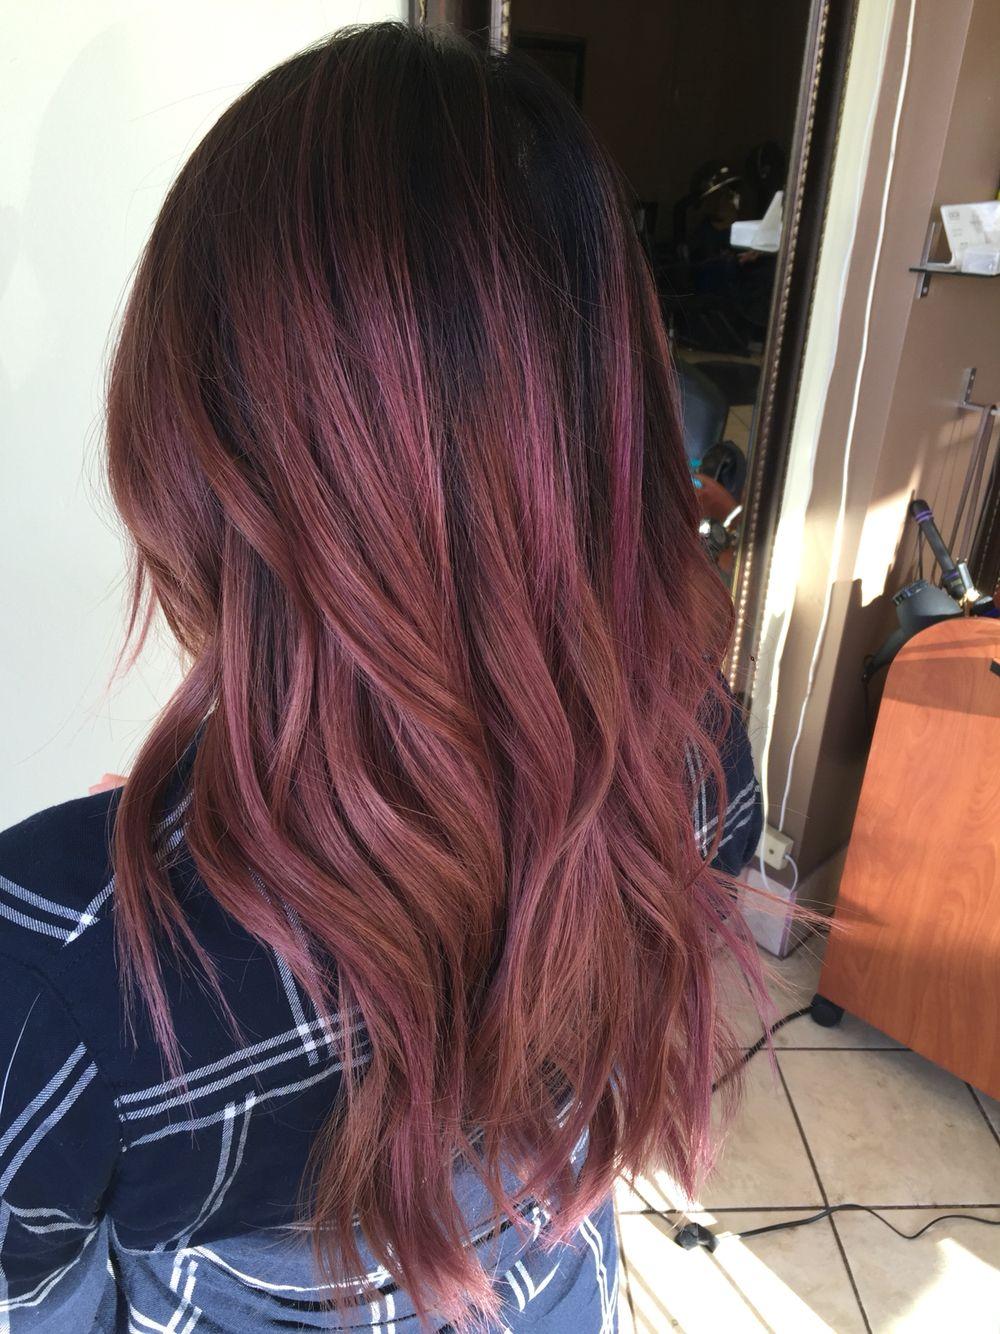 Dark Rose Gold Hair Rose Hair Color Fall Hair Color For Brunettes Hair Styles